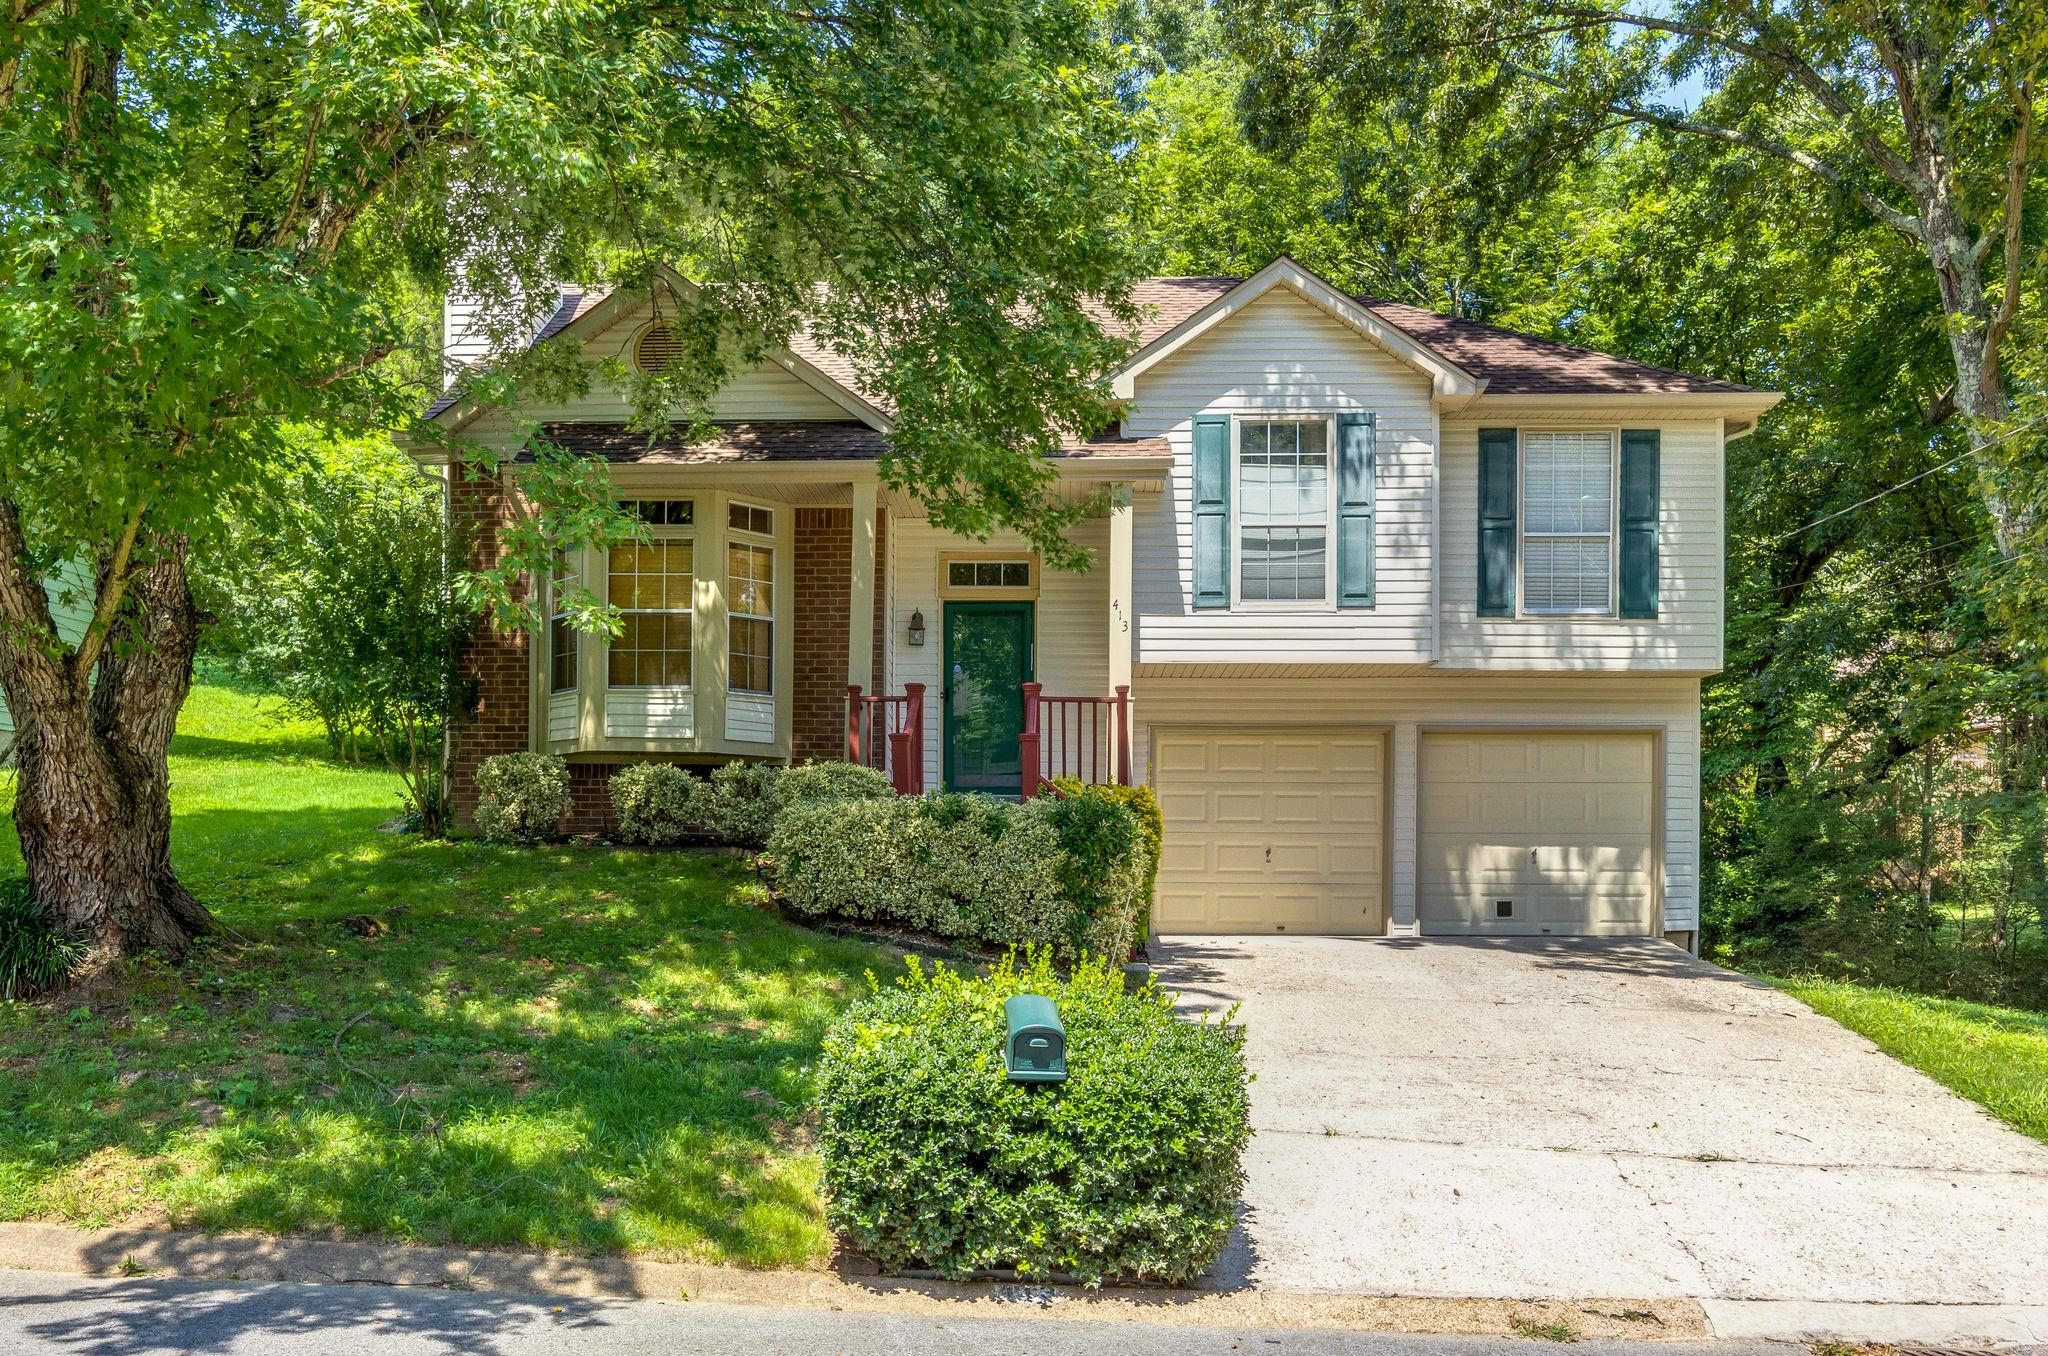 413 Black Mountain Dr, Antioch, TN 37013 - Antioch, TN real estate listing